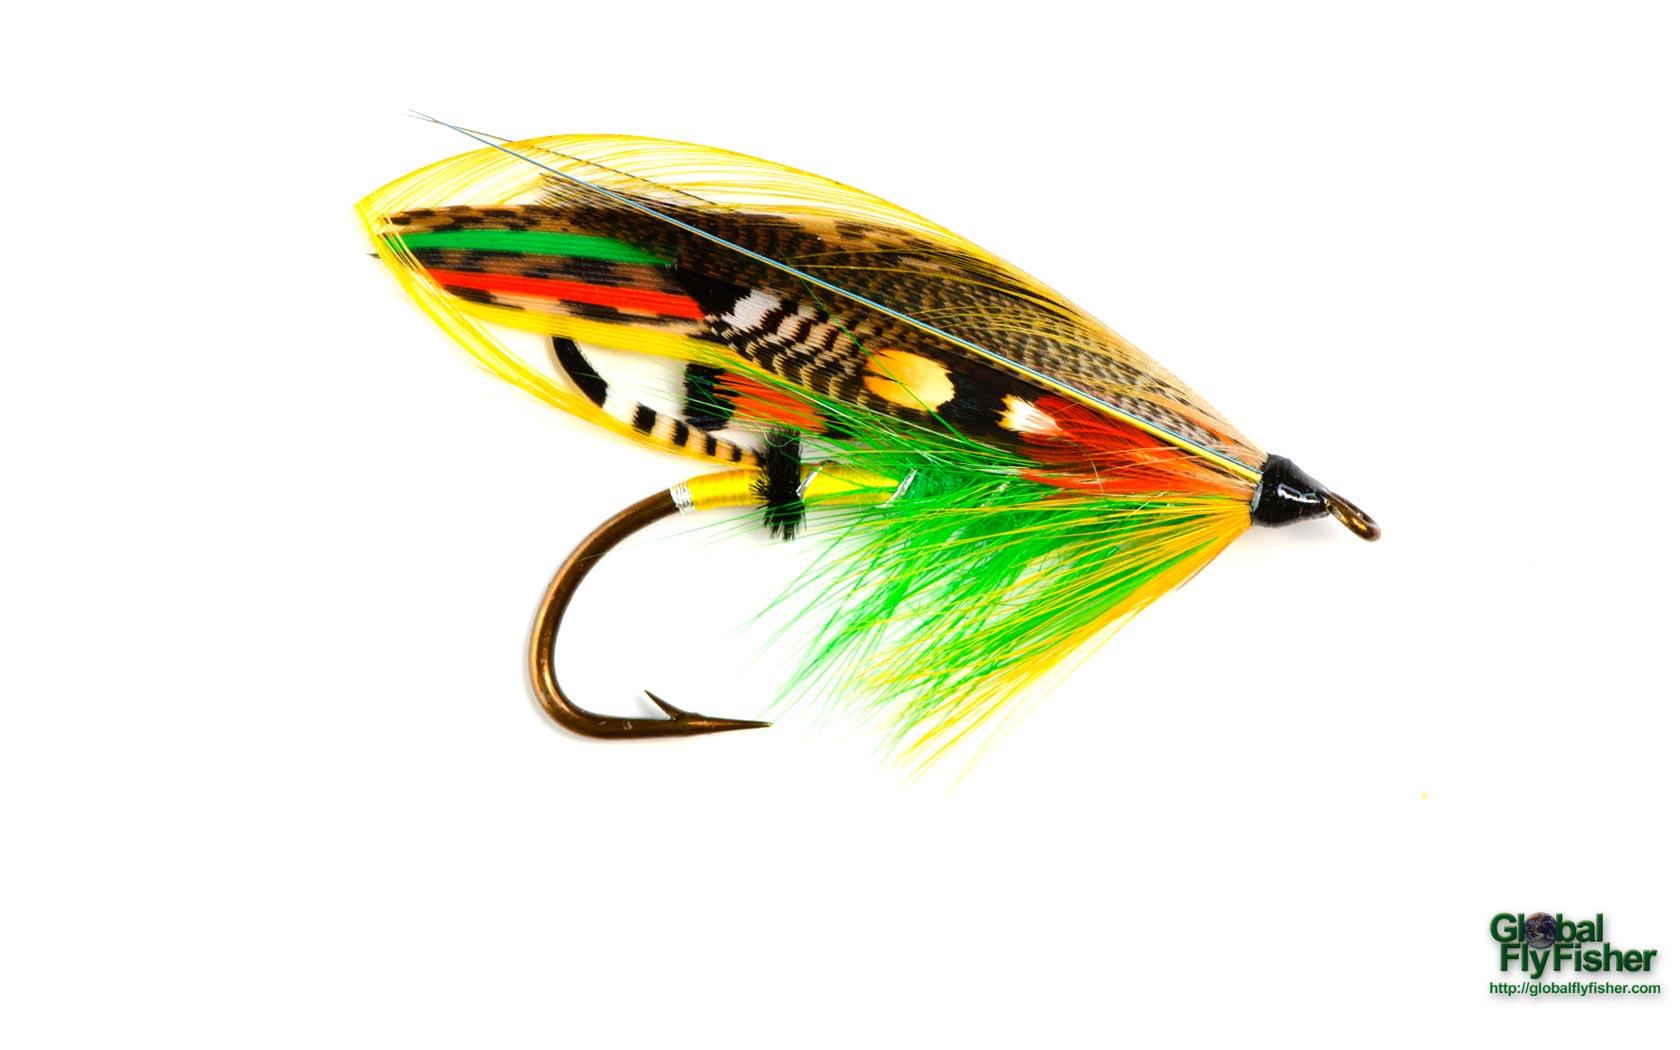 Mcintyre salmon fly global flyfisher for Salon fly